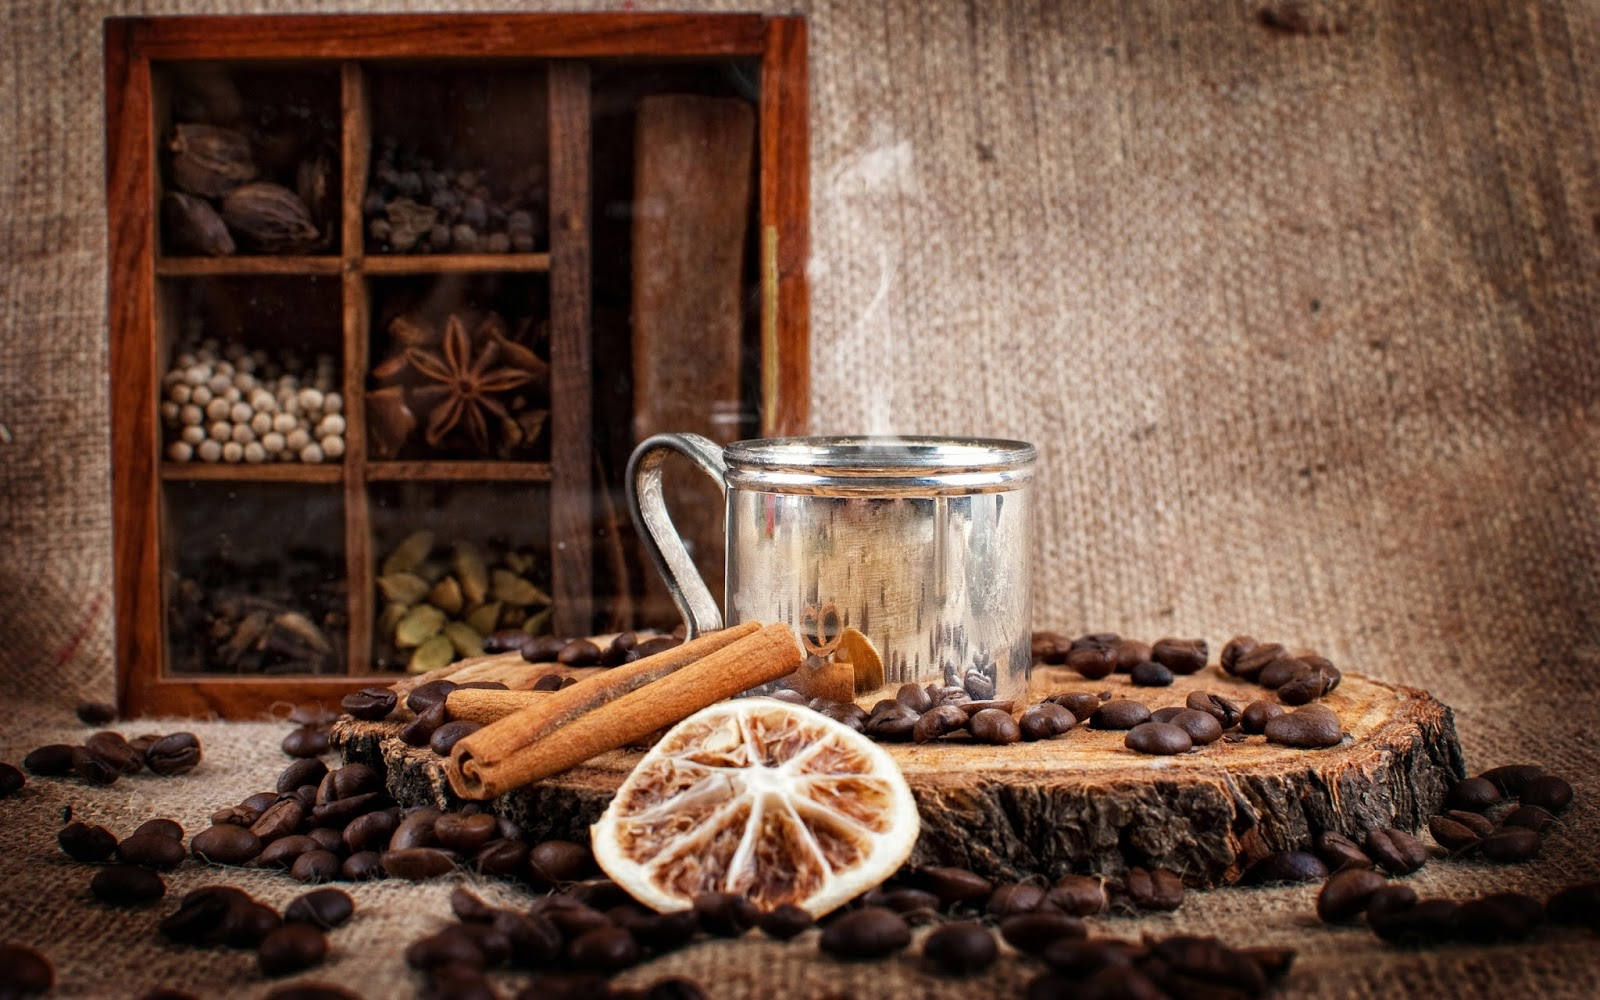 photo coffee-cinnamon-cabinet_zps5tq5qeuo.jpg